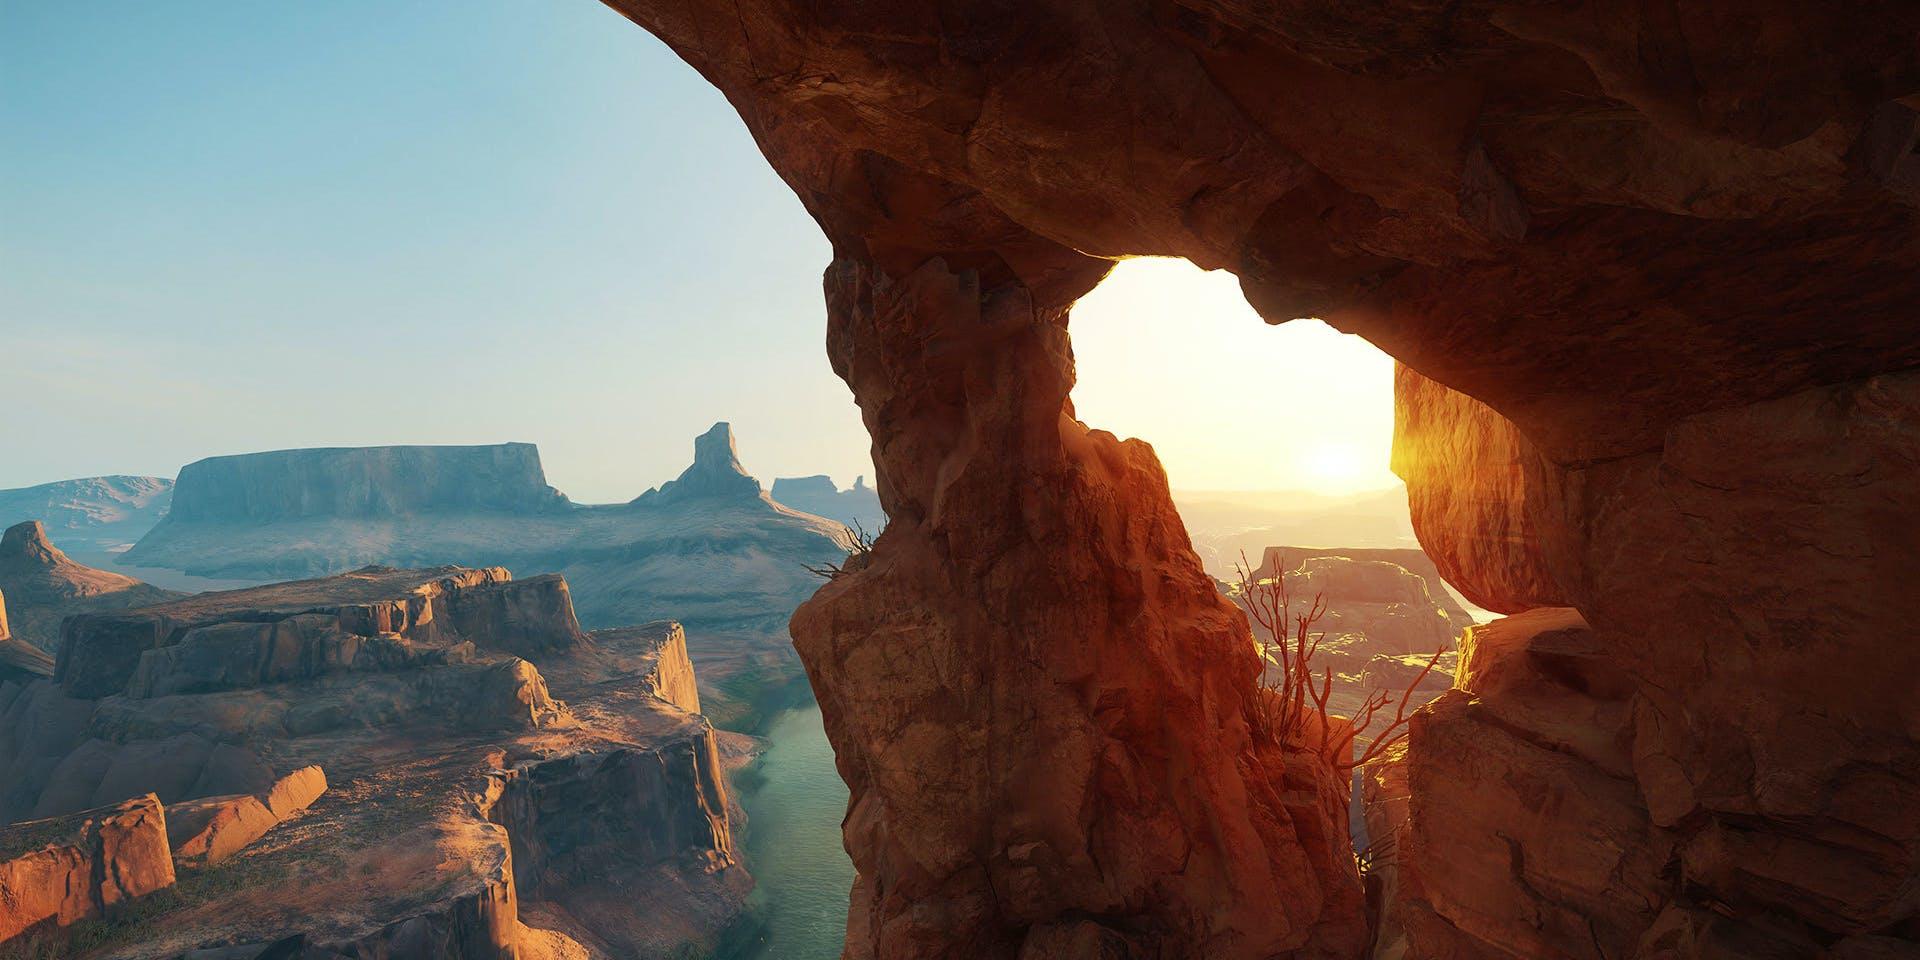 The epic splendor of The Climb's 'Grand Canyon'